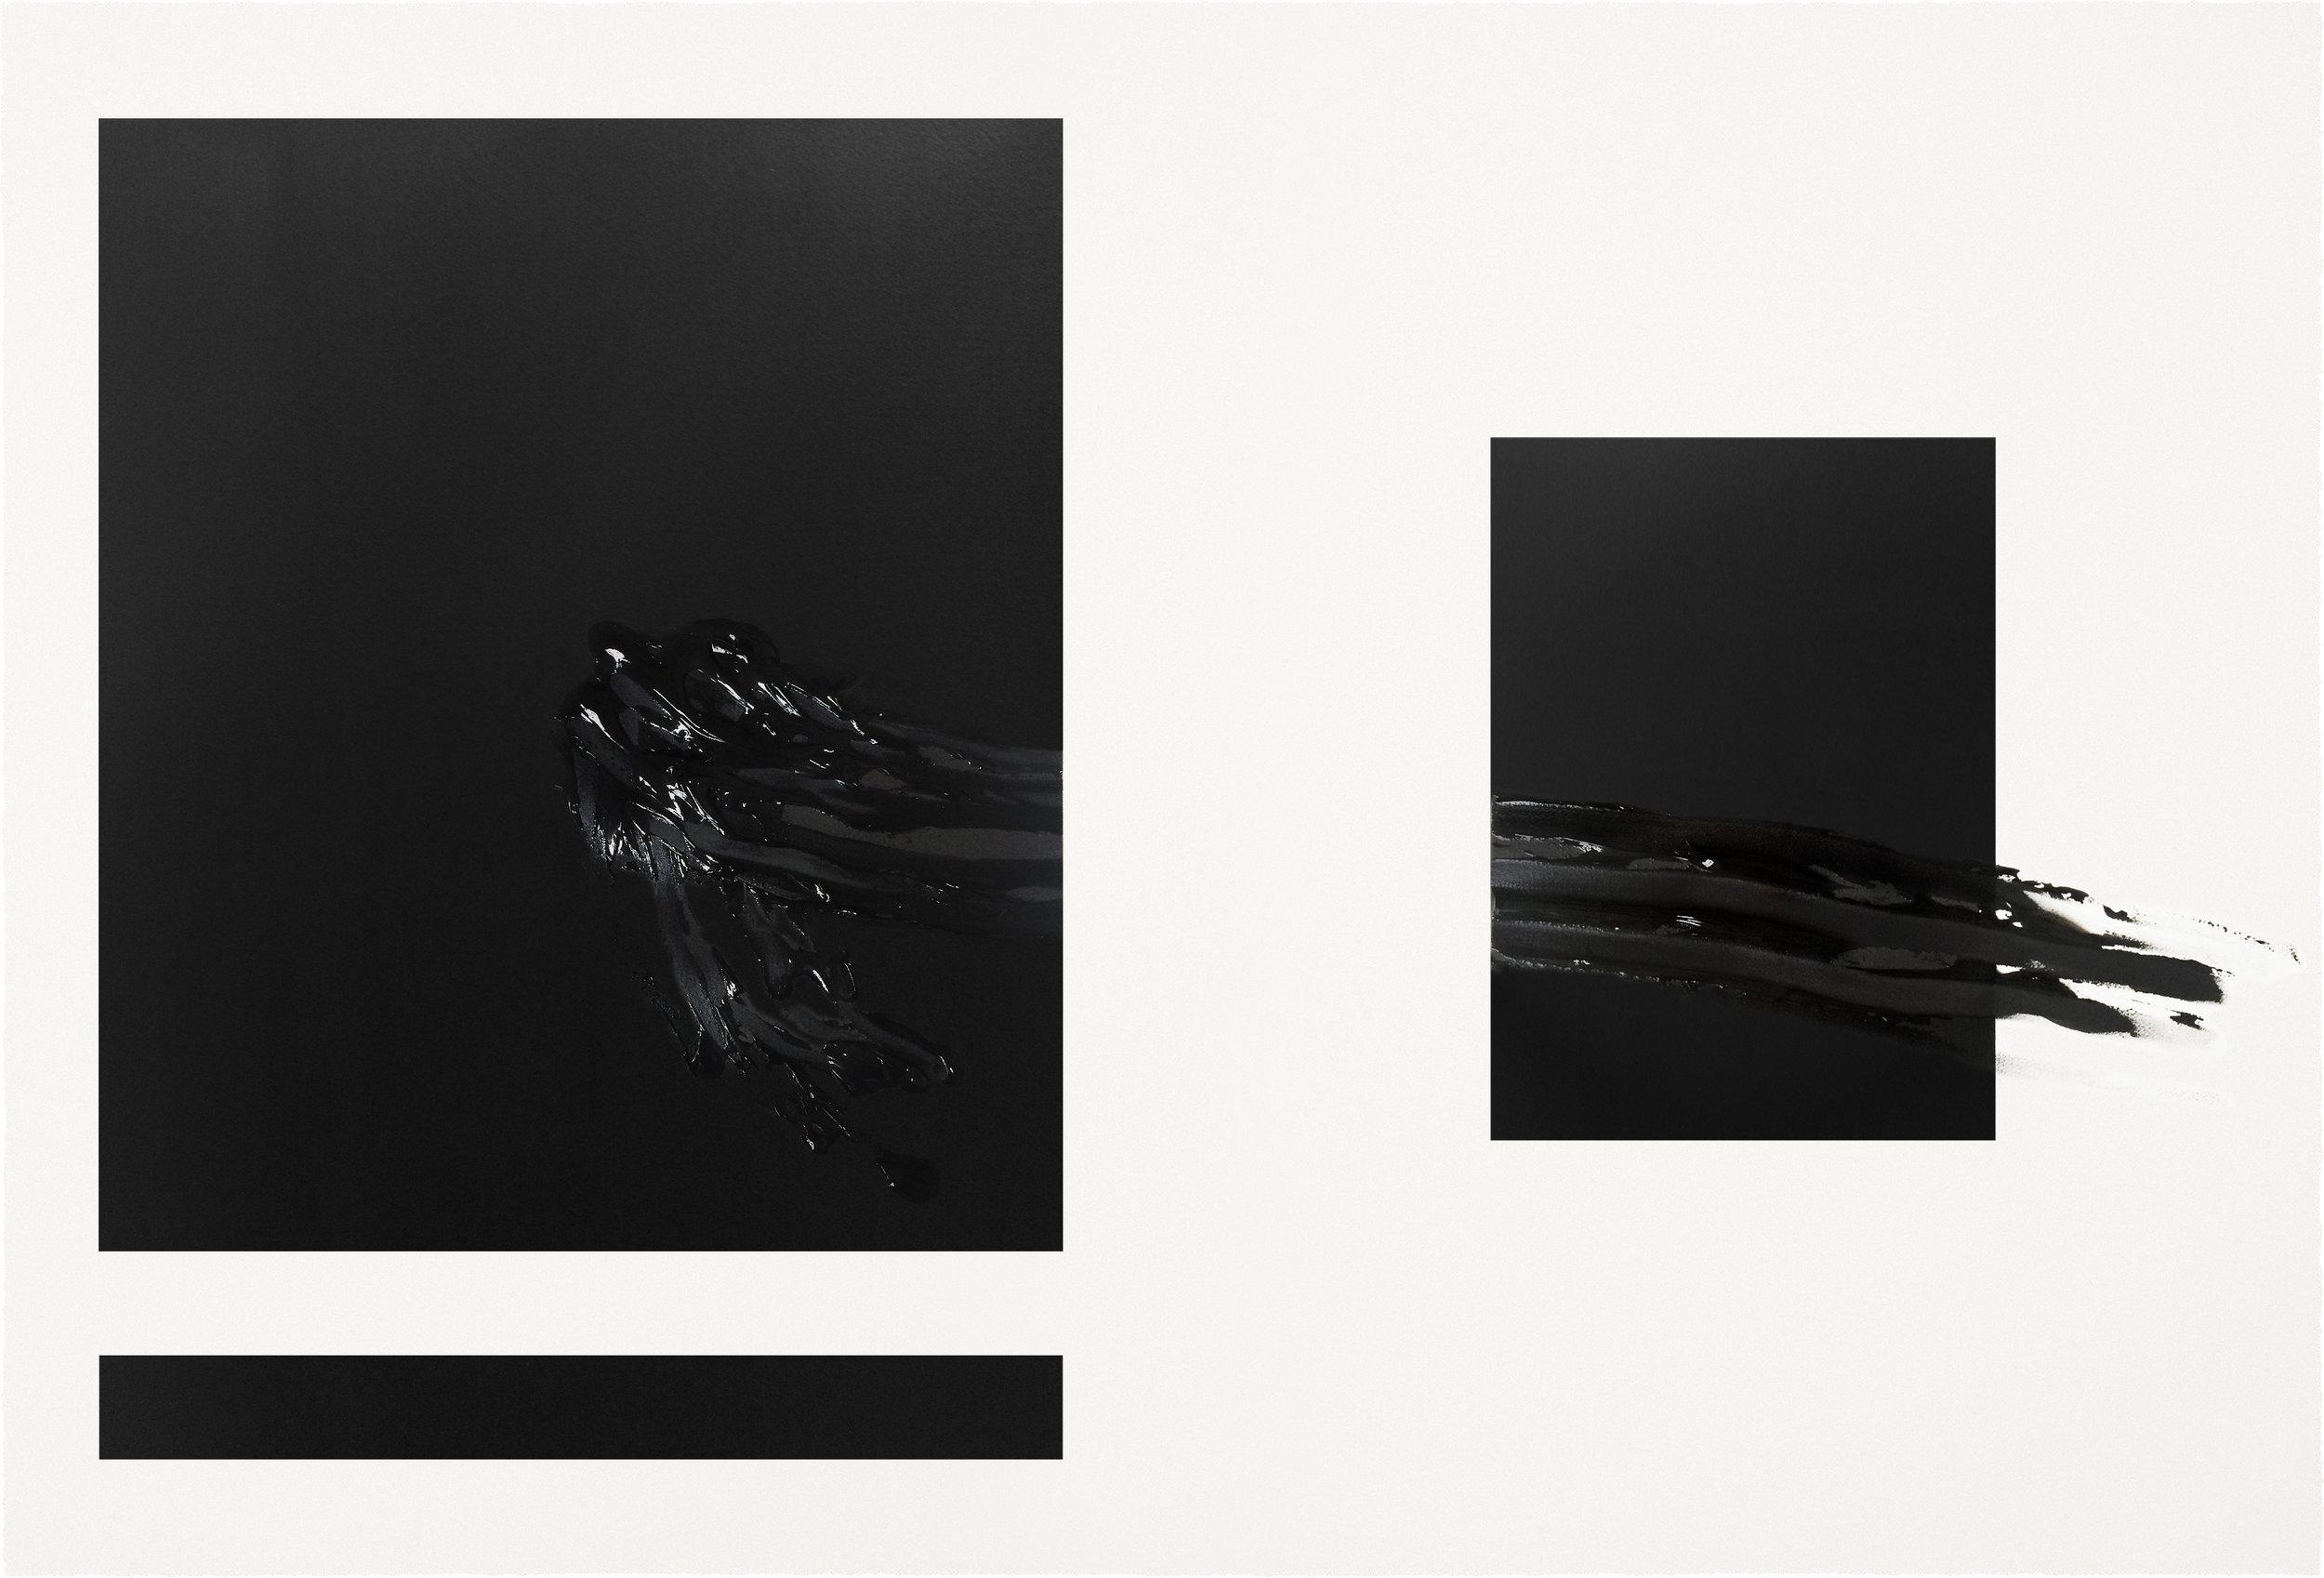 Dos Líneas — Diego Berjon